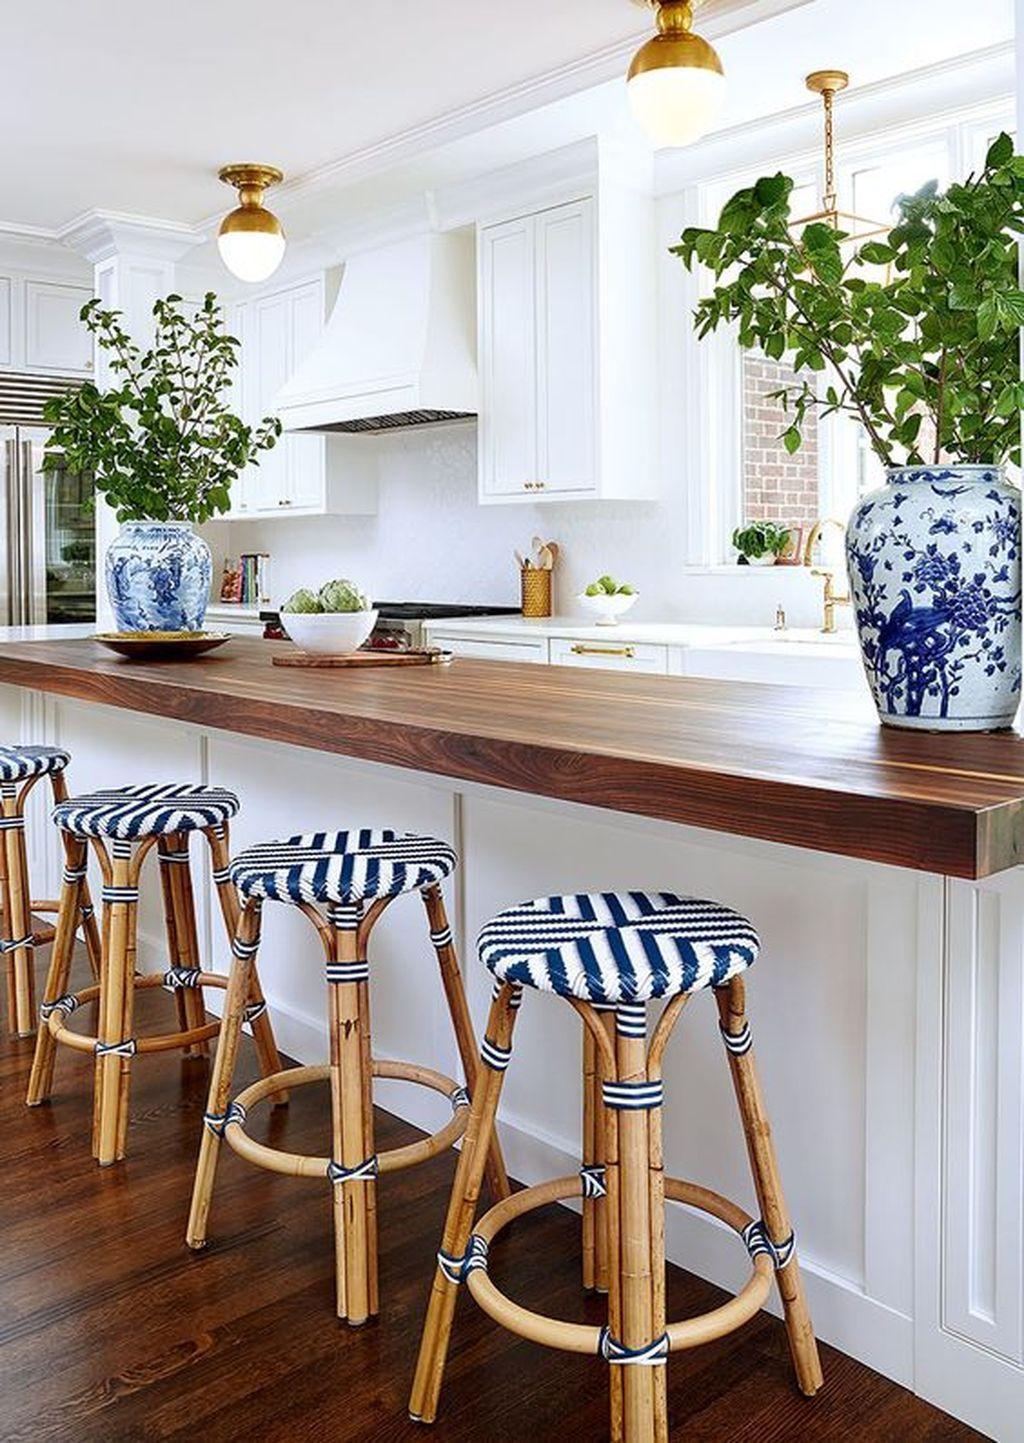 36 Gorgeous Coastal Kitchen Decoration Ideas Popy Home Home Decor Kitchen Interior Design Kitchen Outdoor Kitchen Countertops